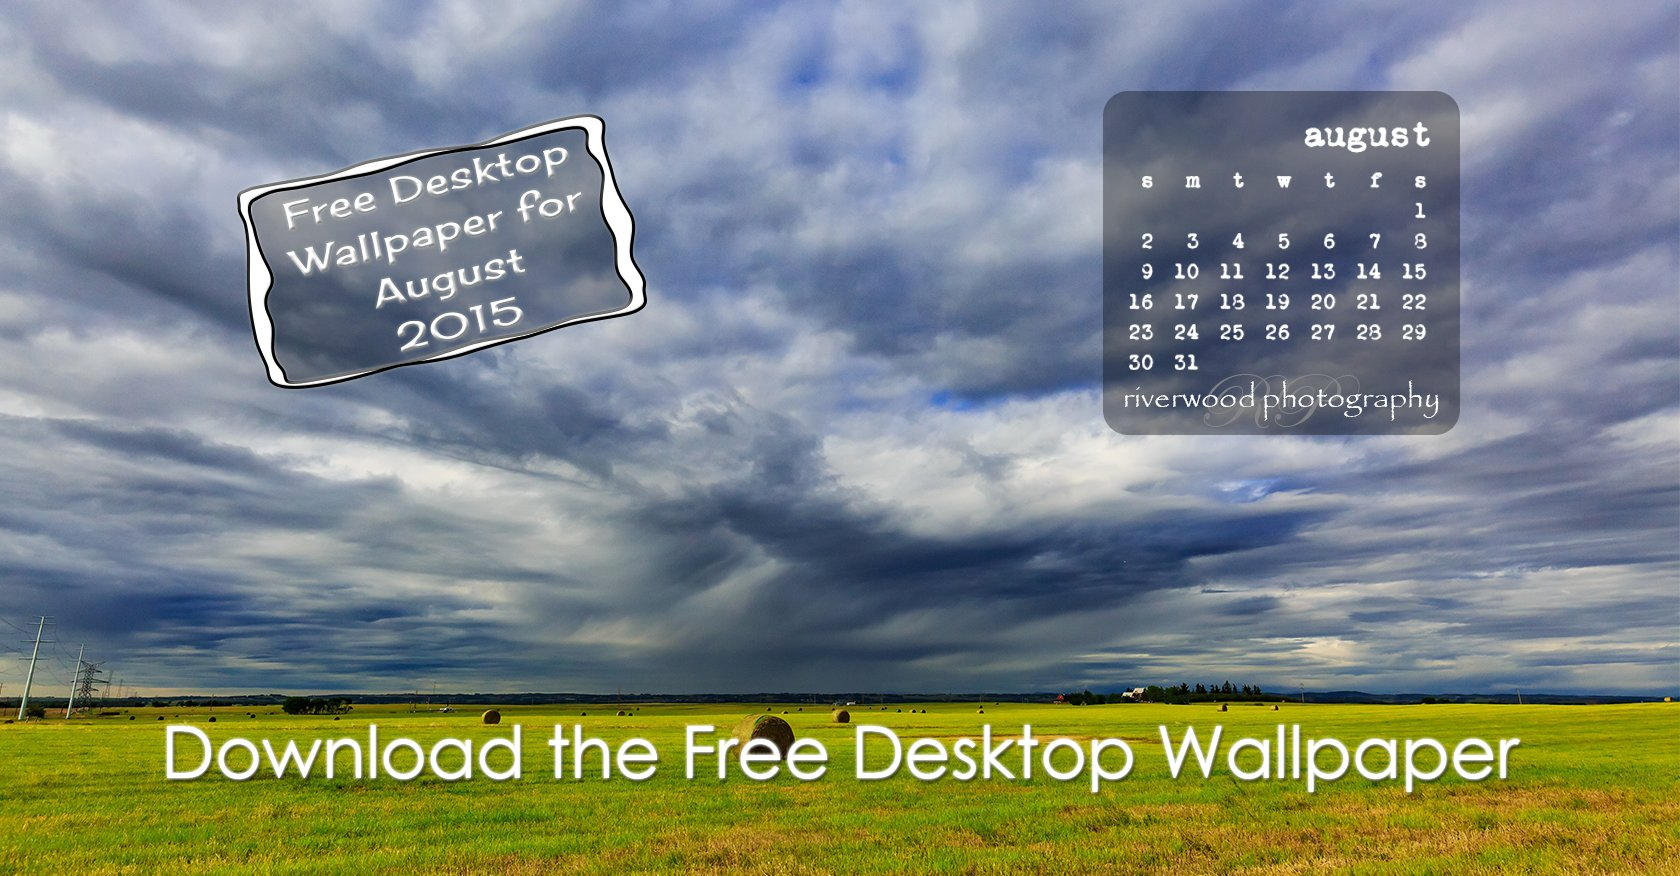 Free Desktop Wallpaper for August 2015